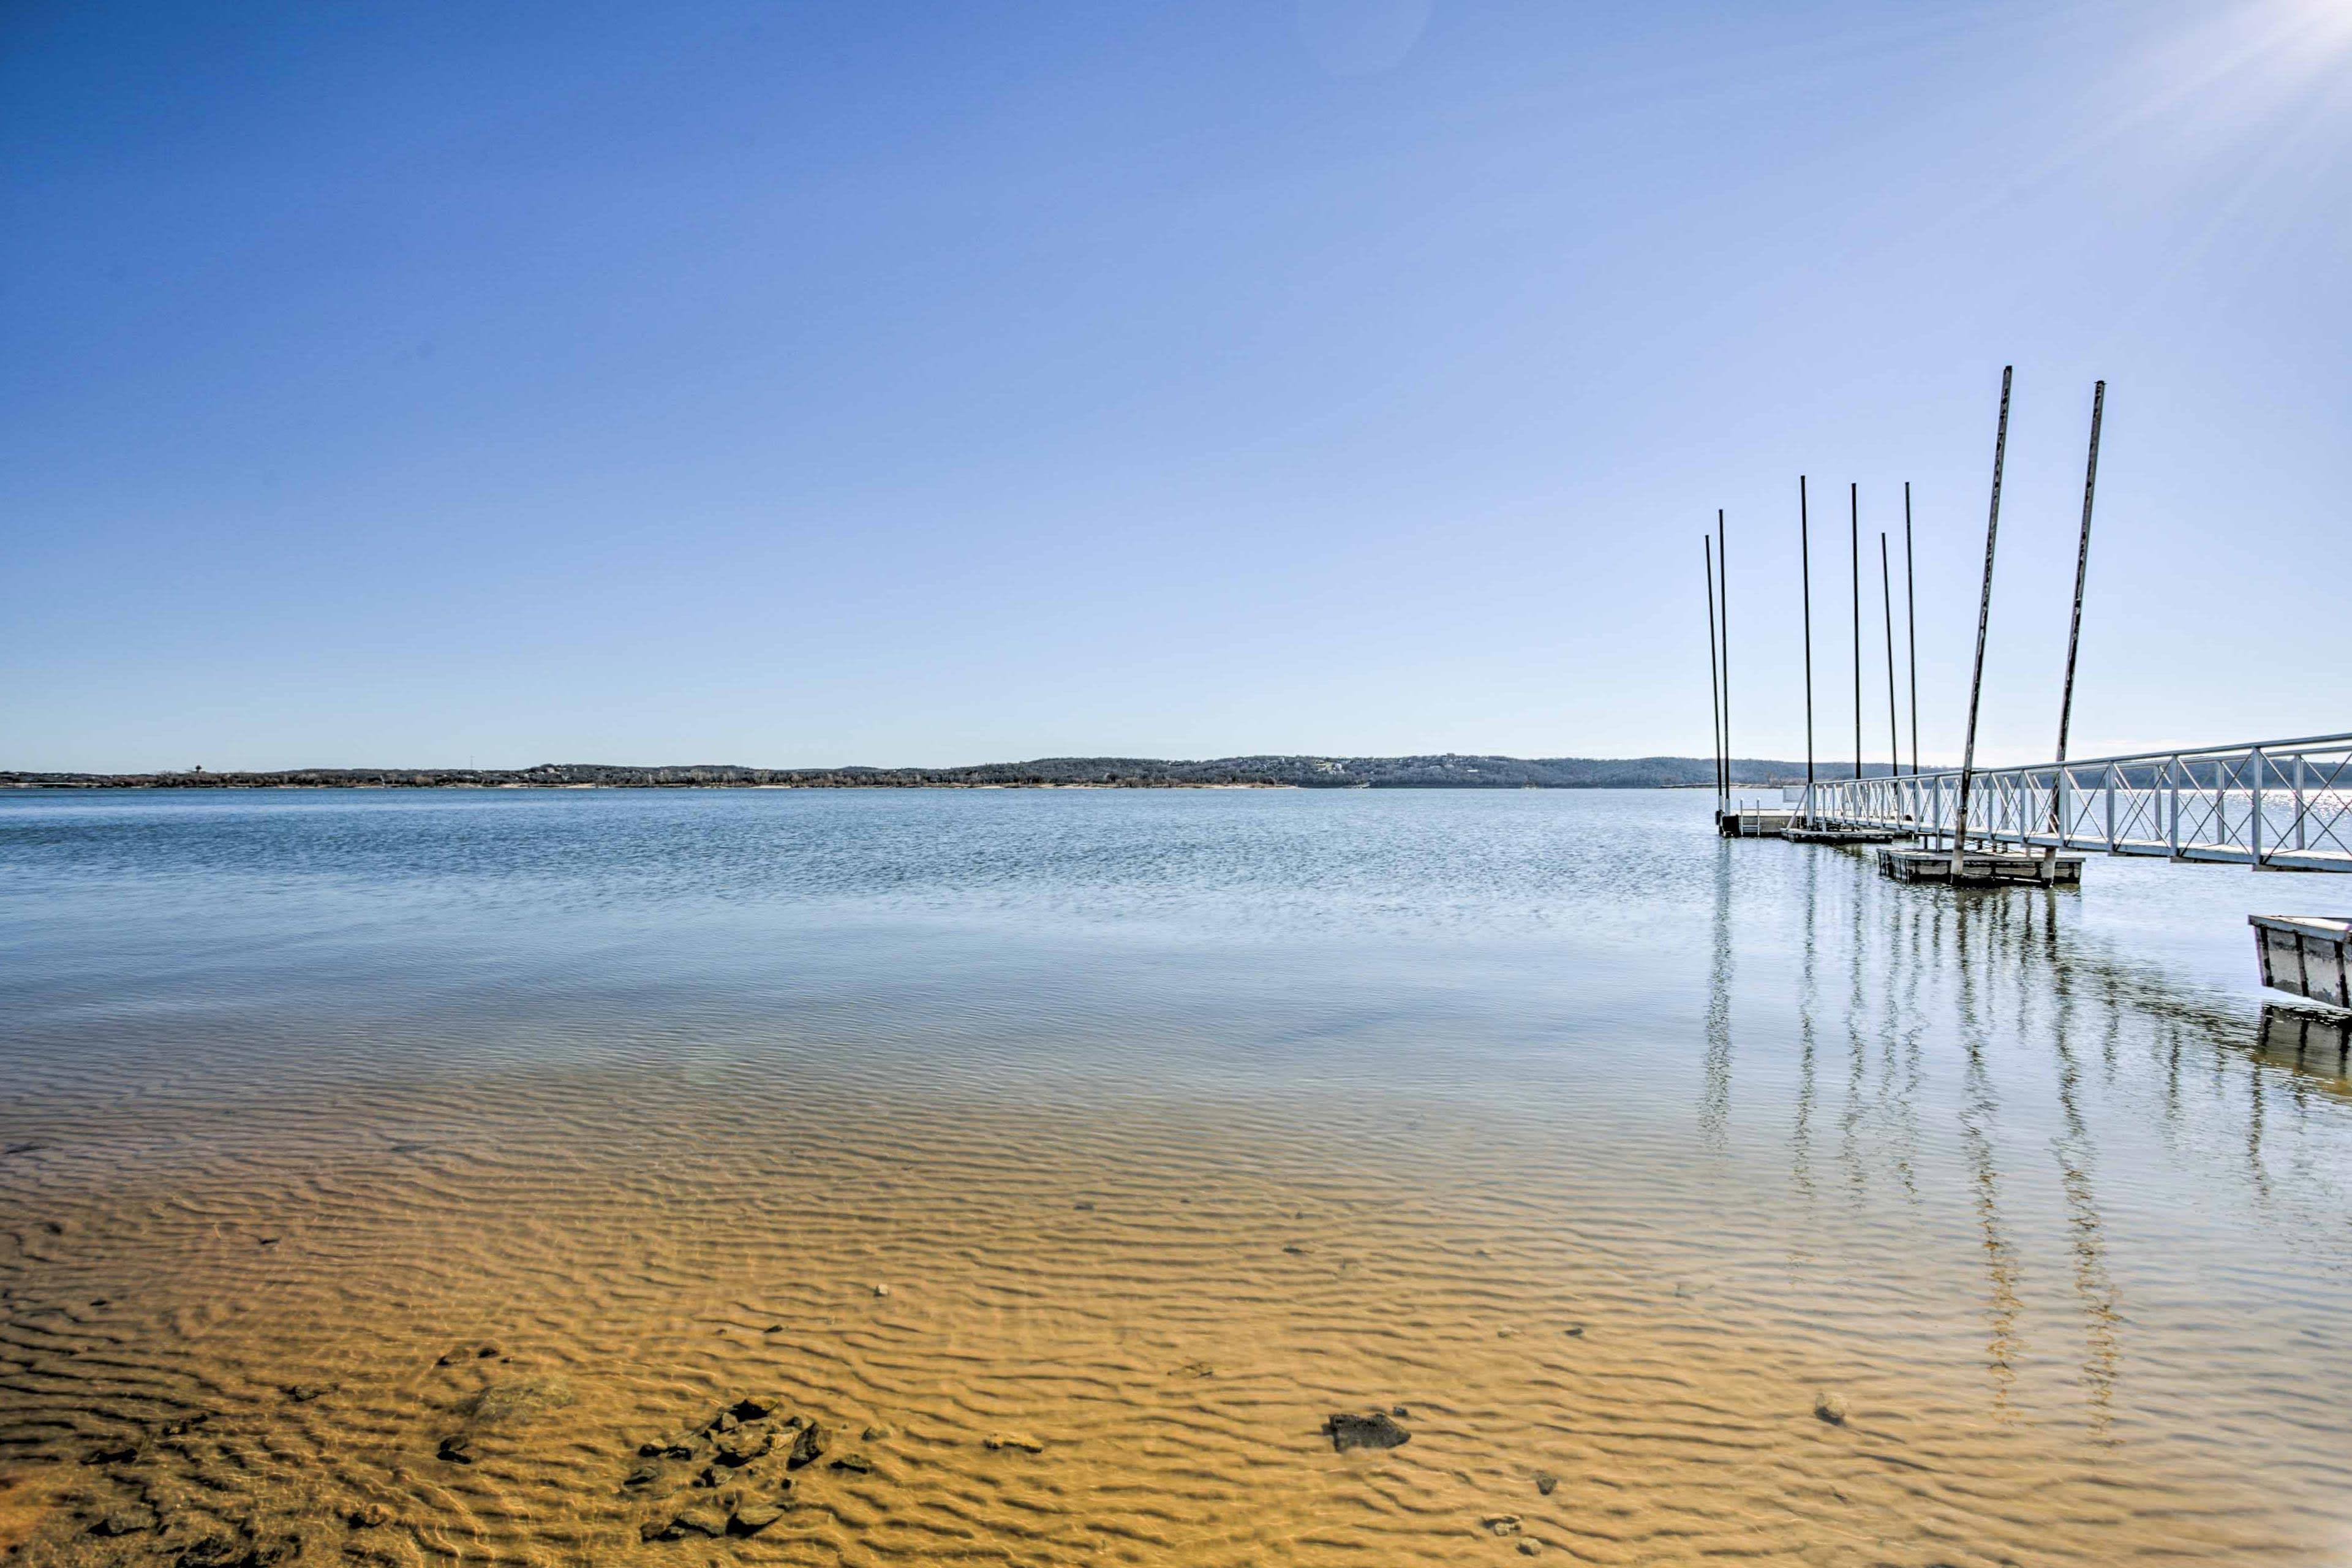 Walk down for endless days on Lake Texoma!